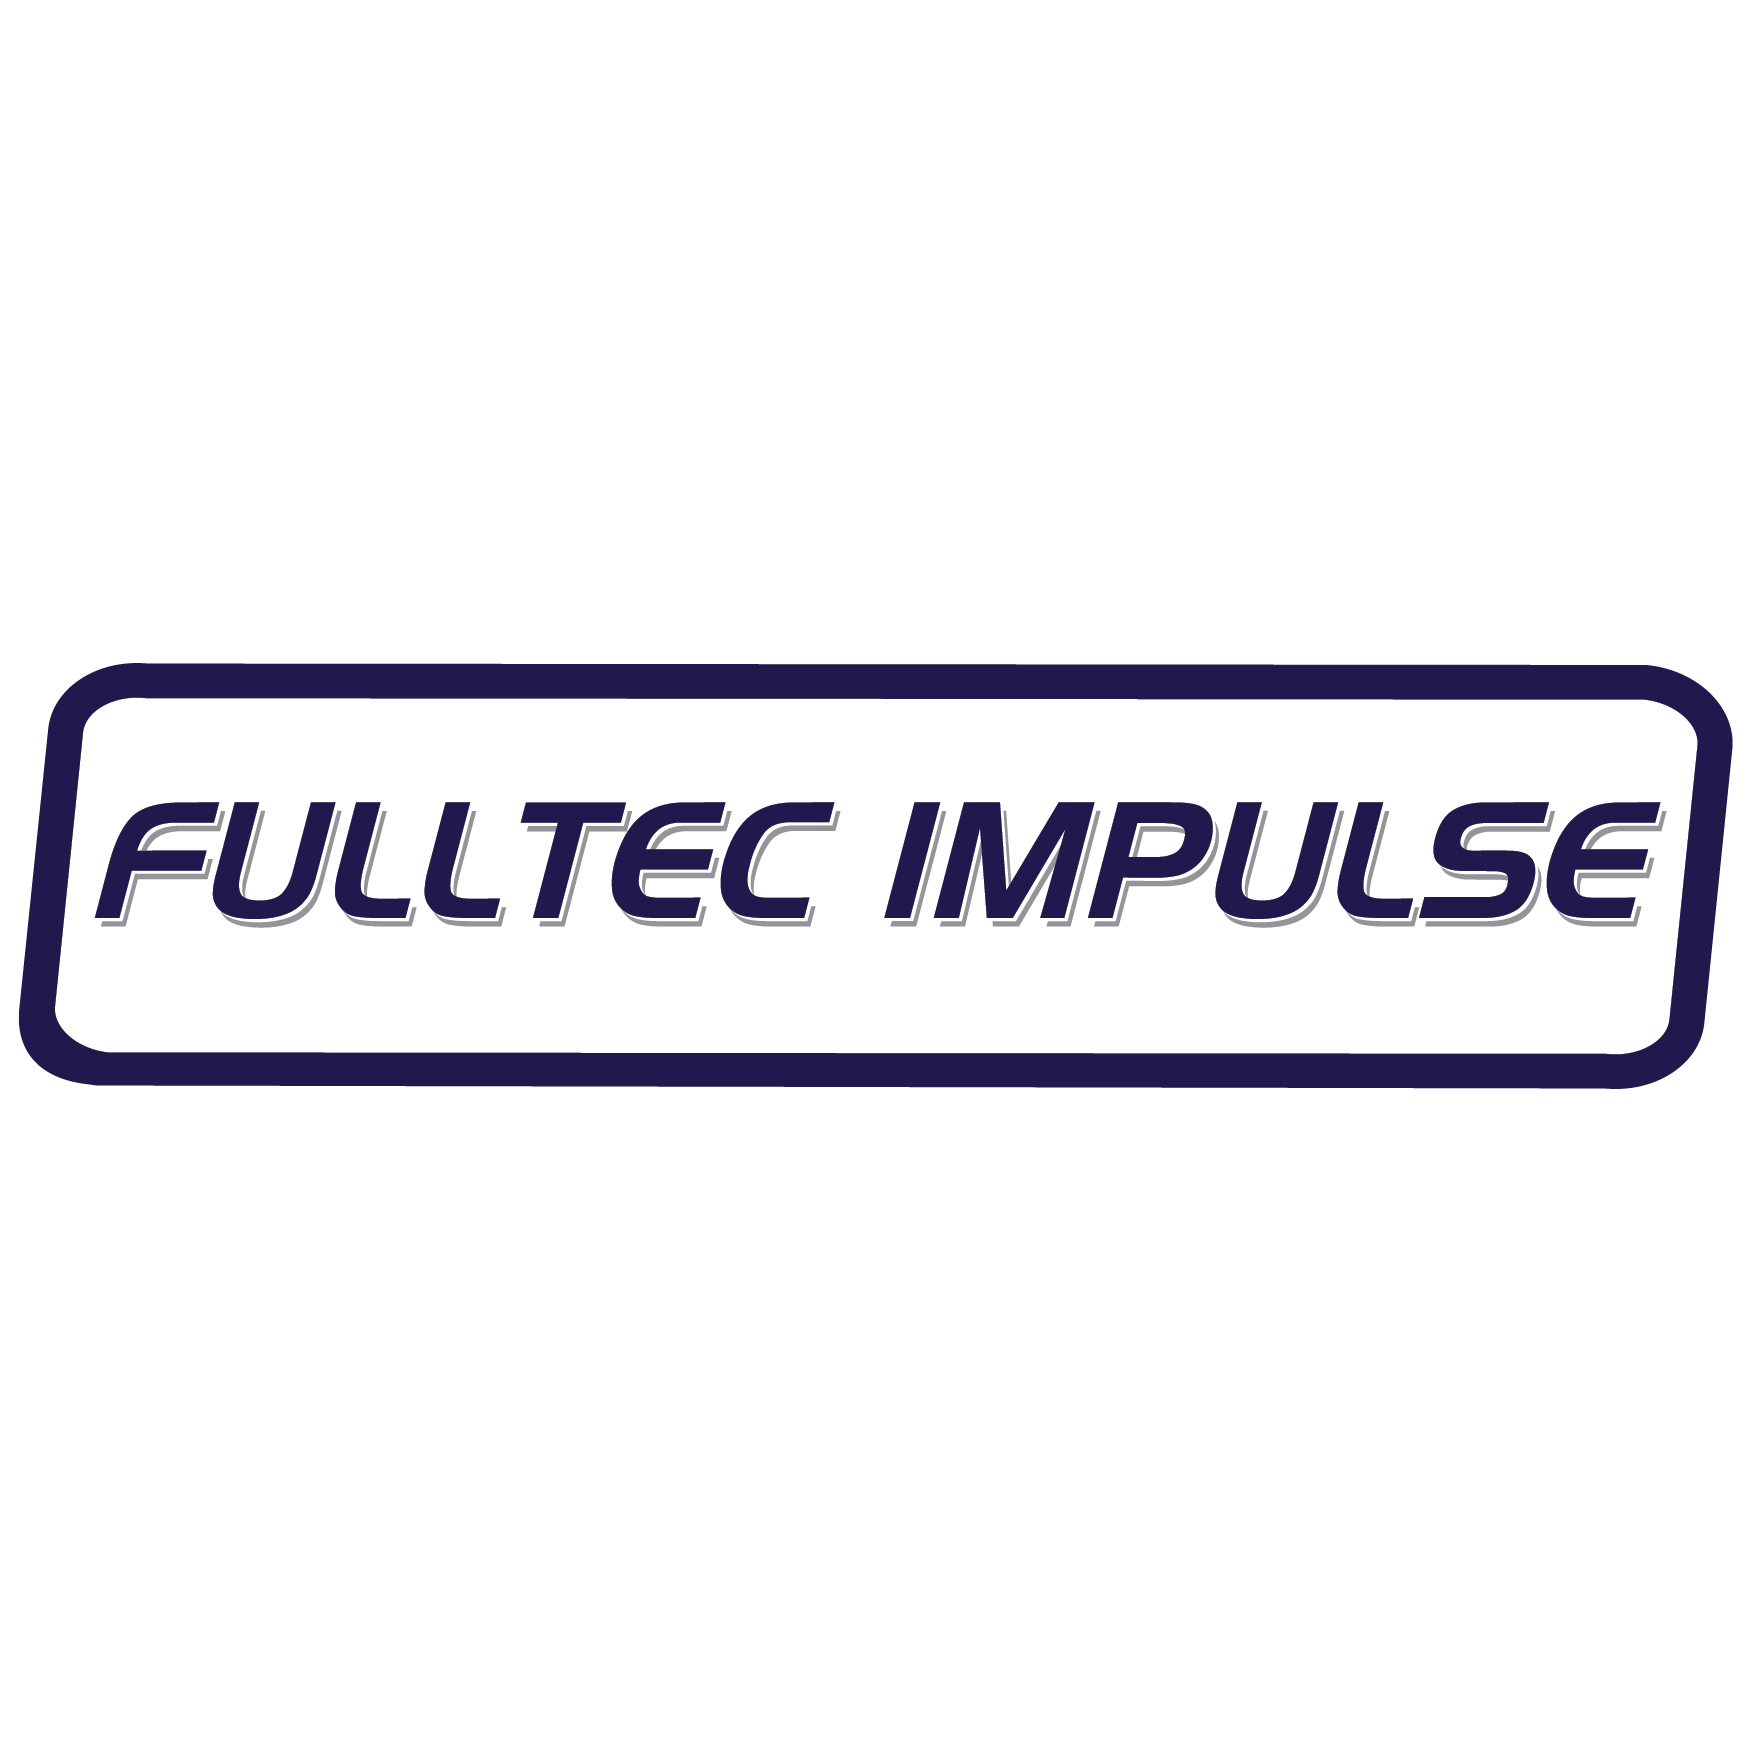 Nome do produto: Fulltec Impulse